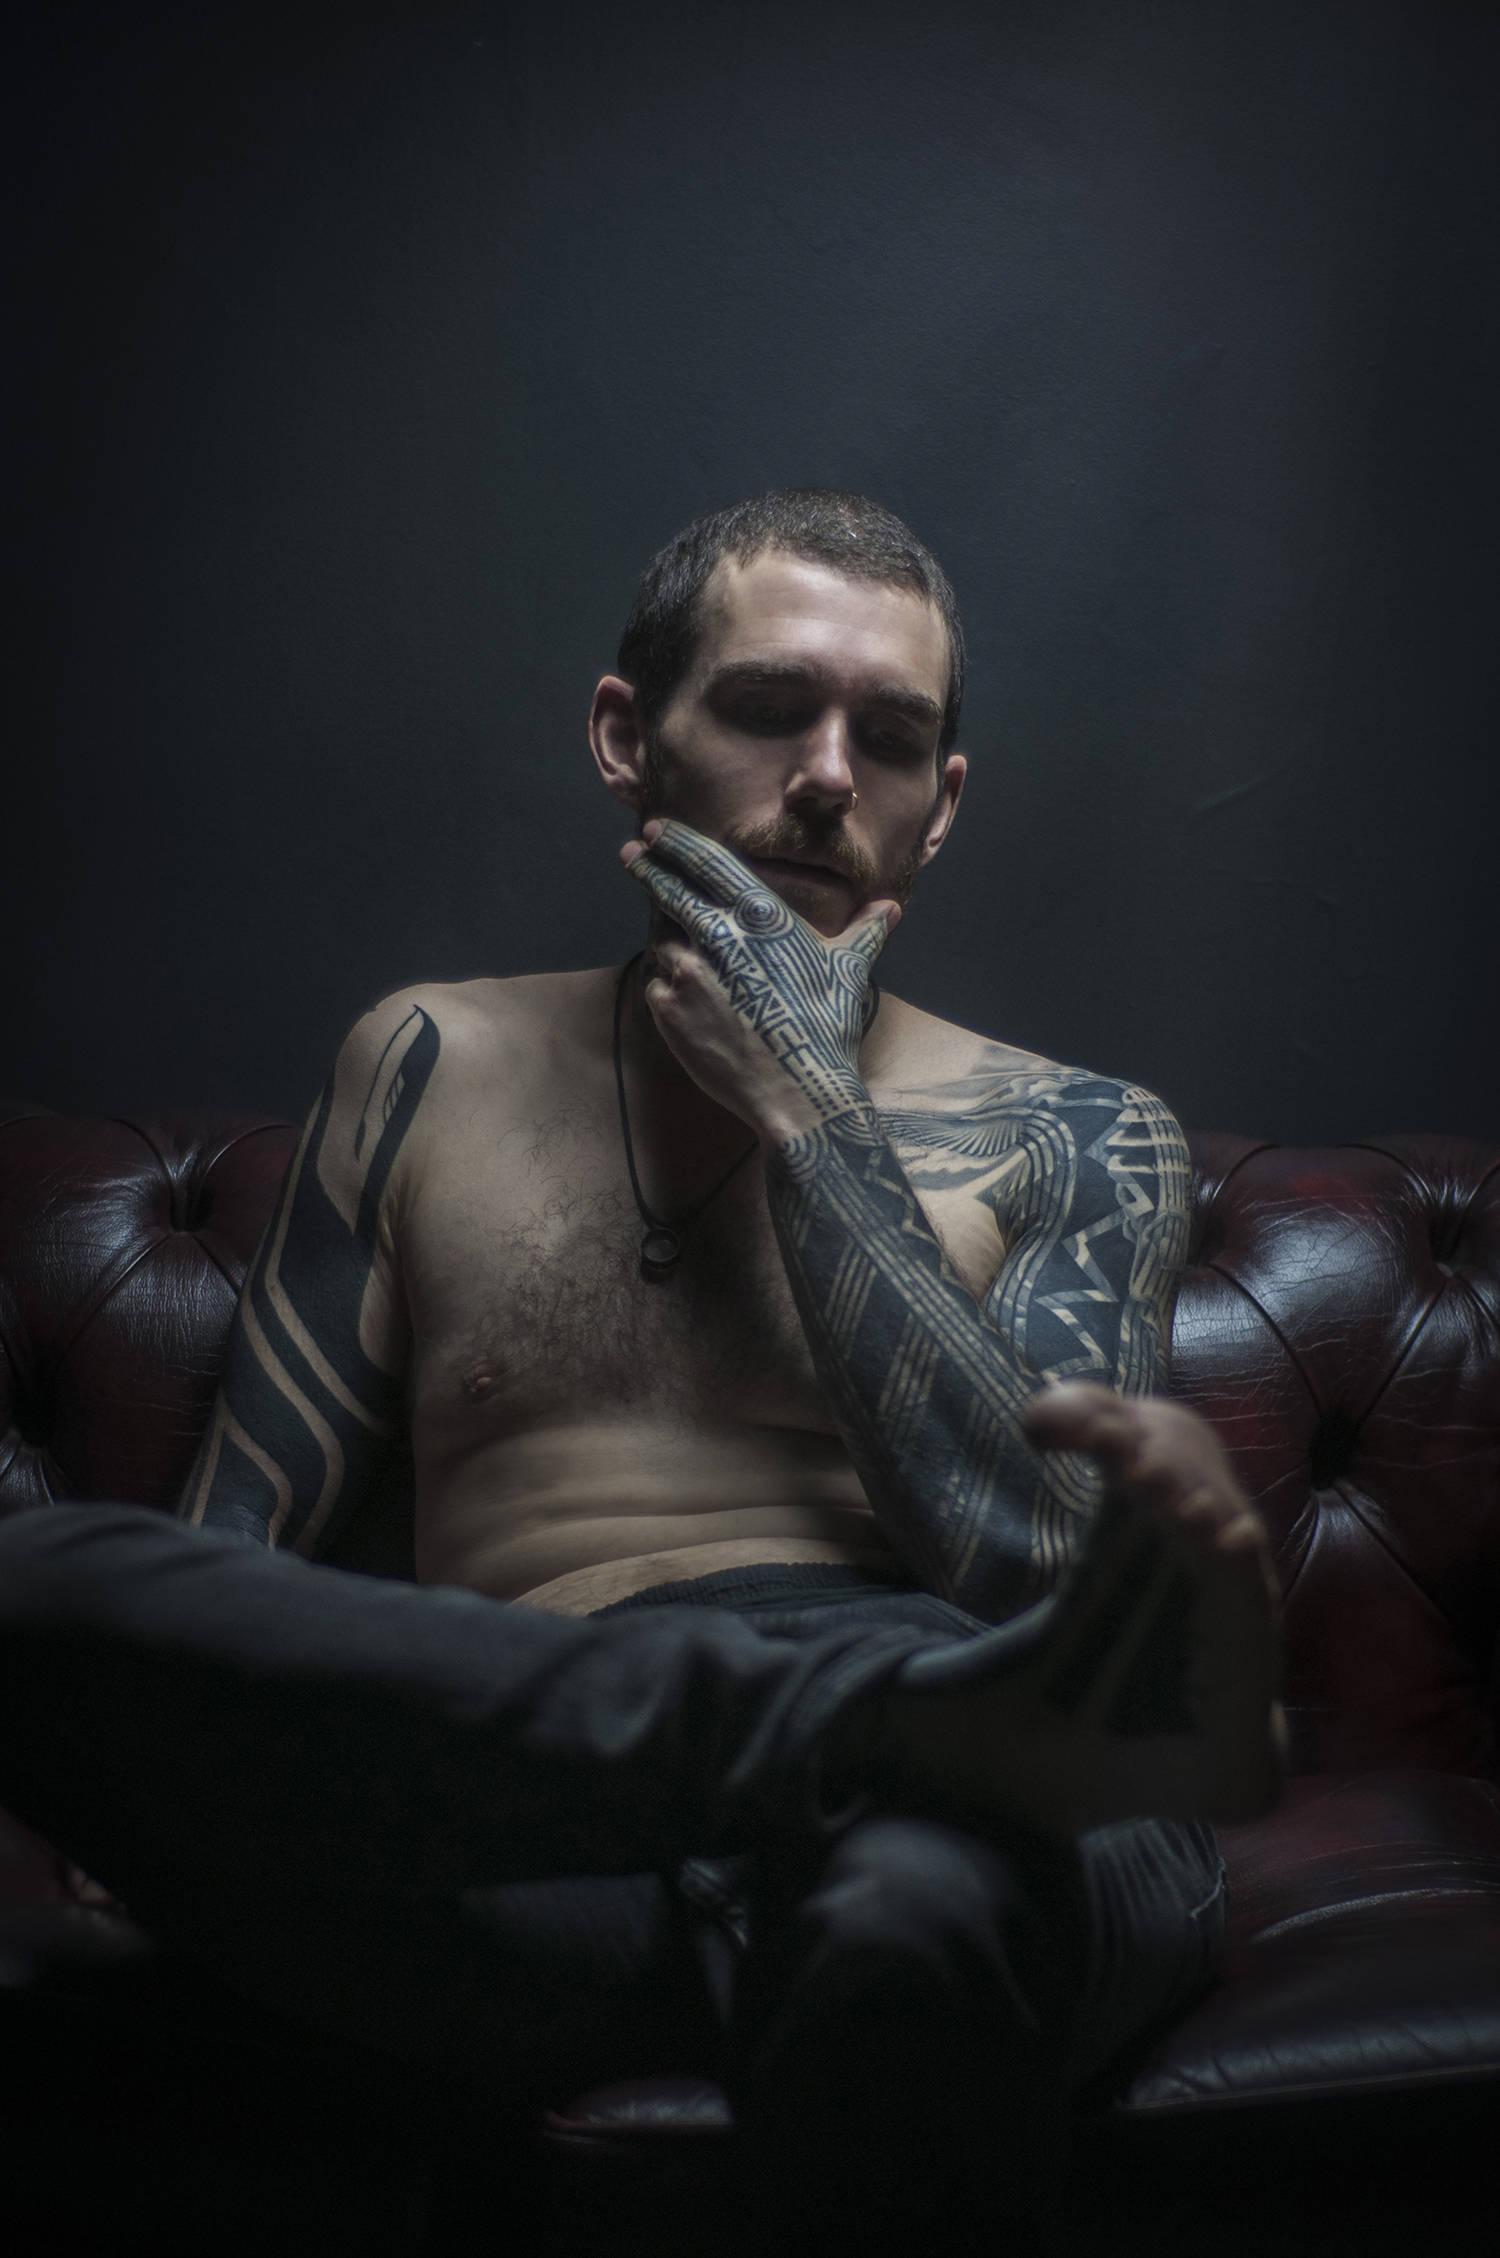 Paul Offline tattooist, photography